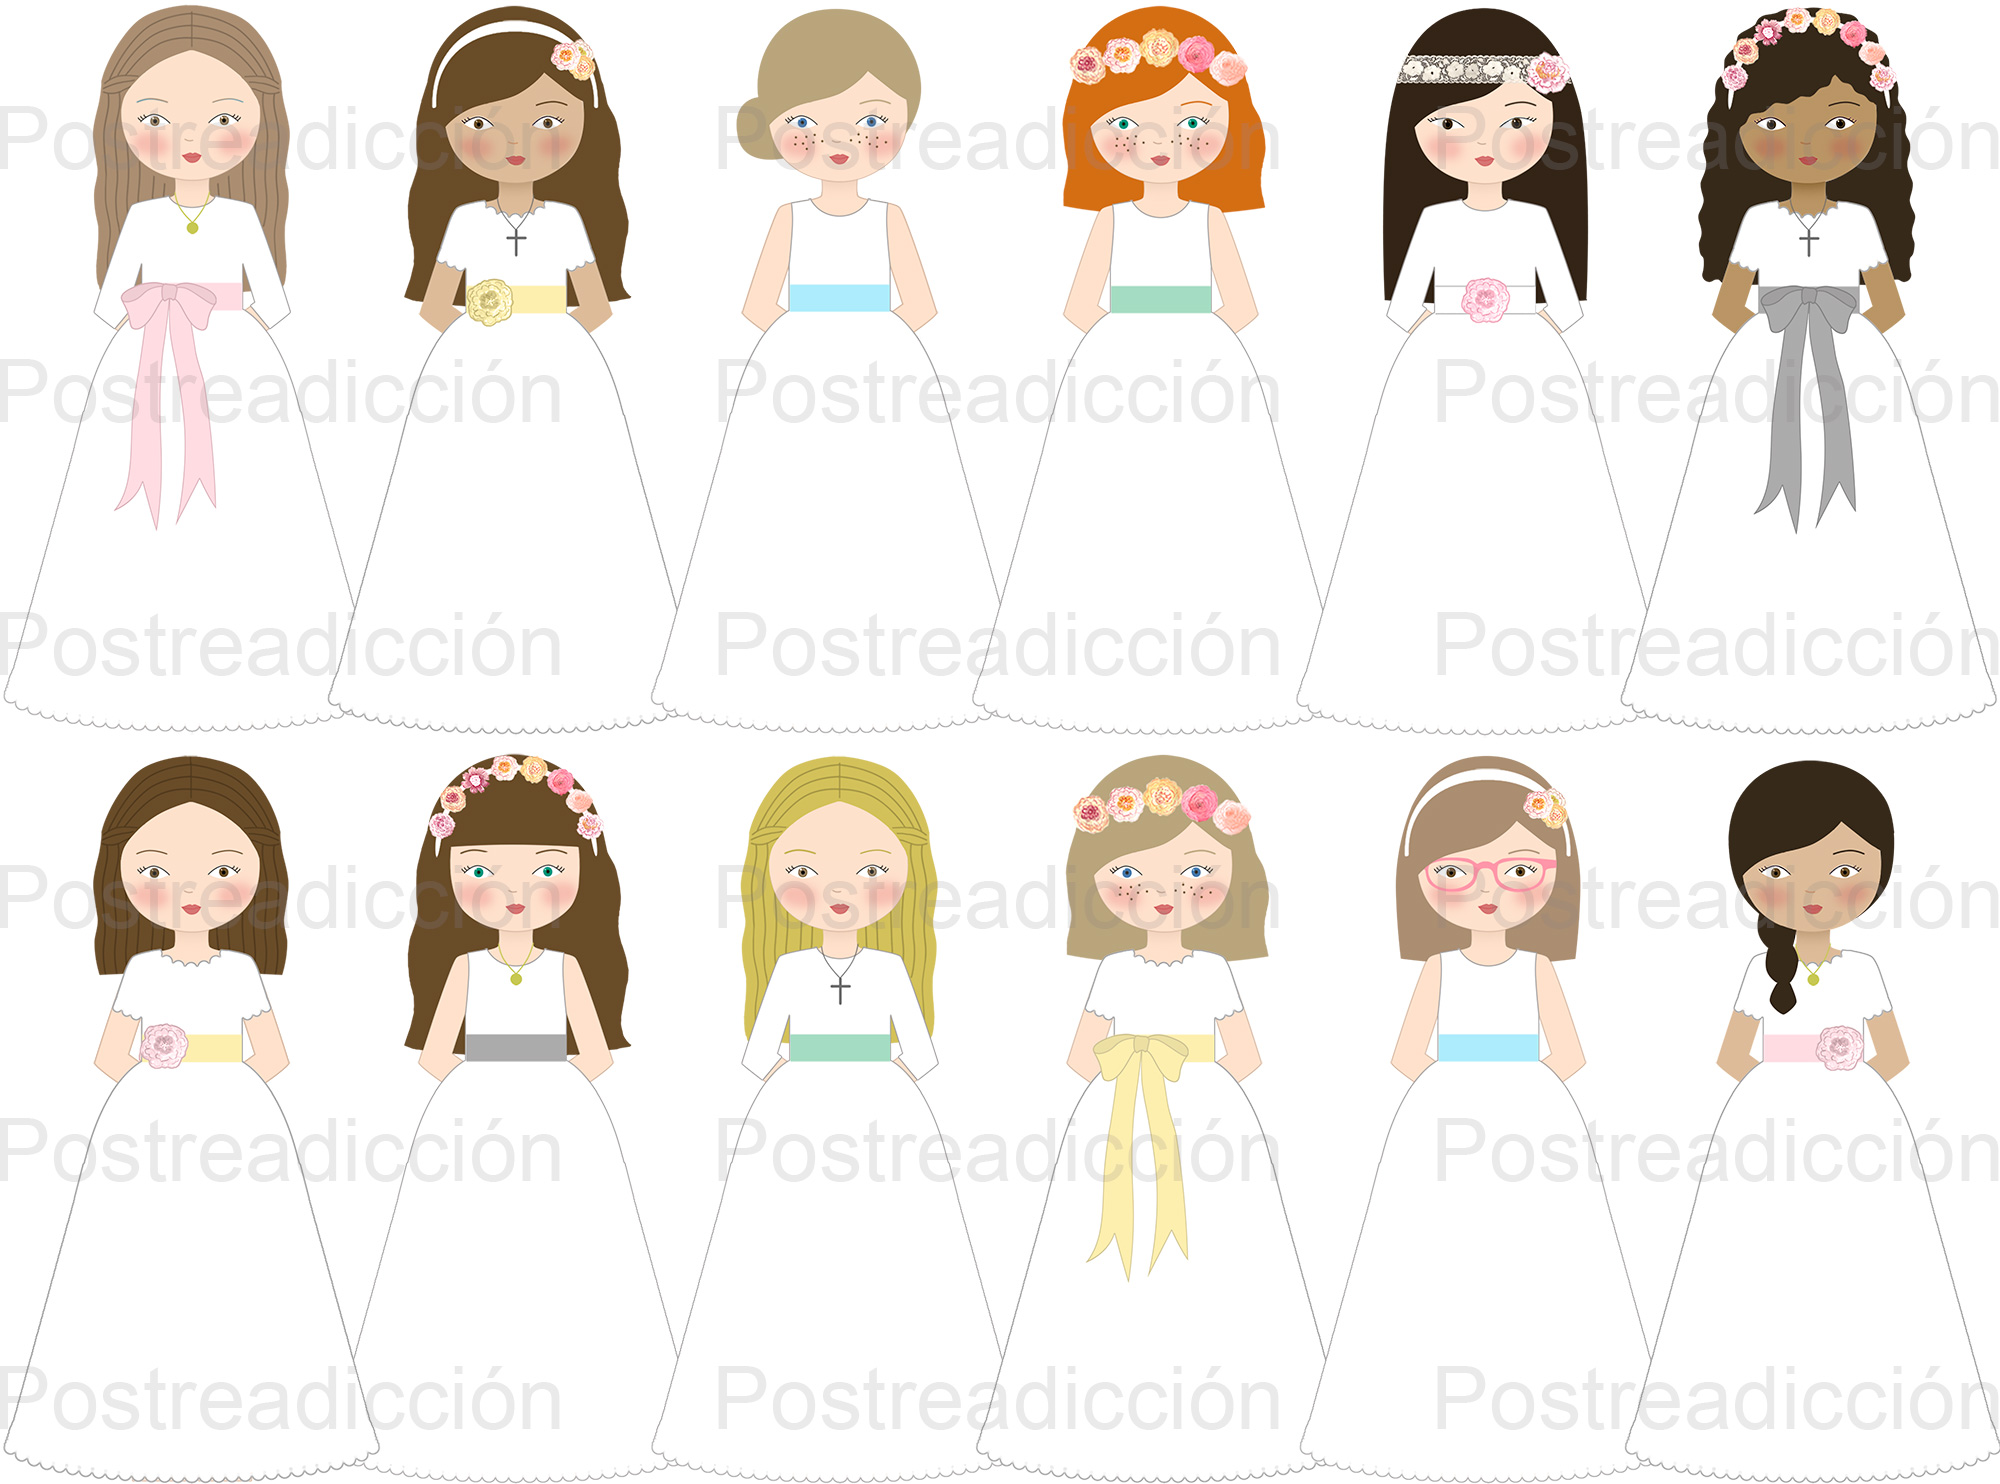 Imagen de producto: https://tienda.postreadiccion.com/img/articulos/secundarias13176-modelo-no-1677-nina-de-comunion-carlota-para-barritas-1.jpg